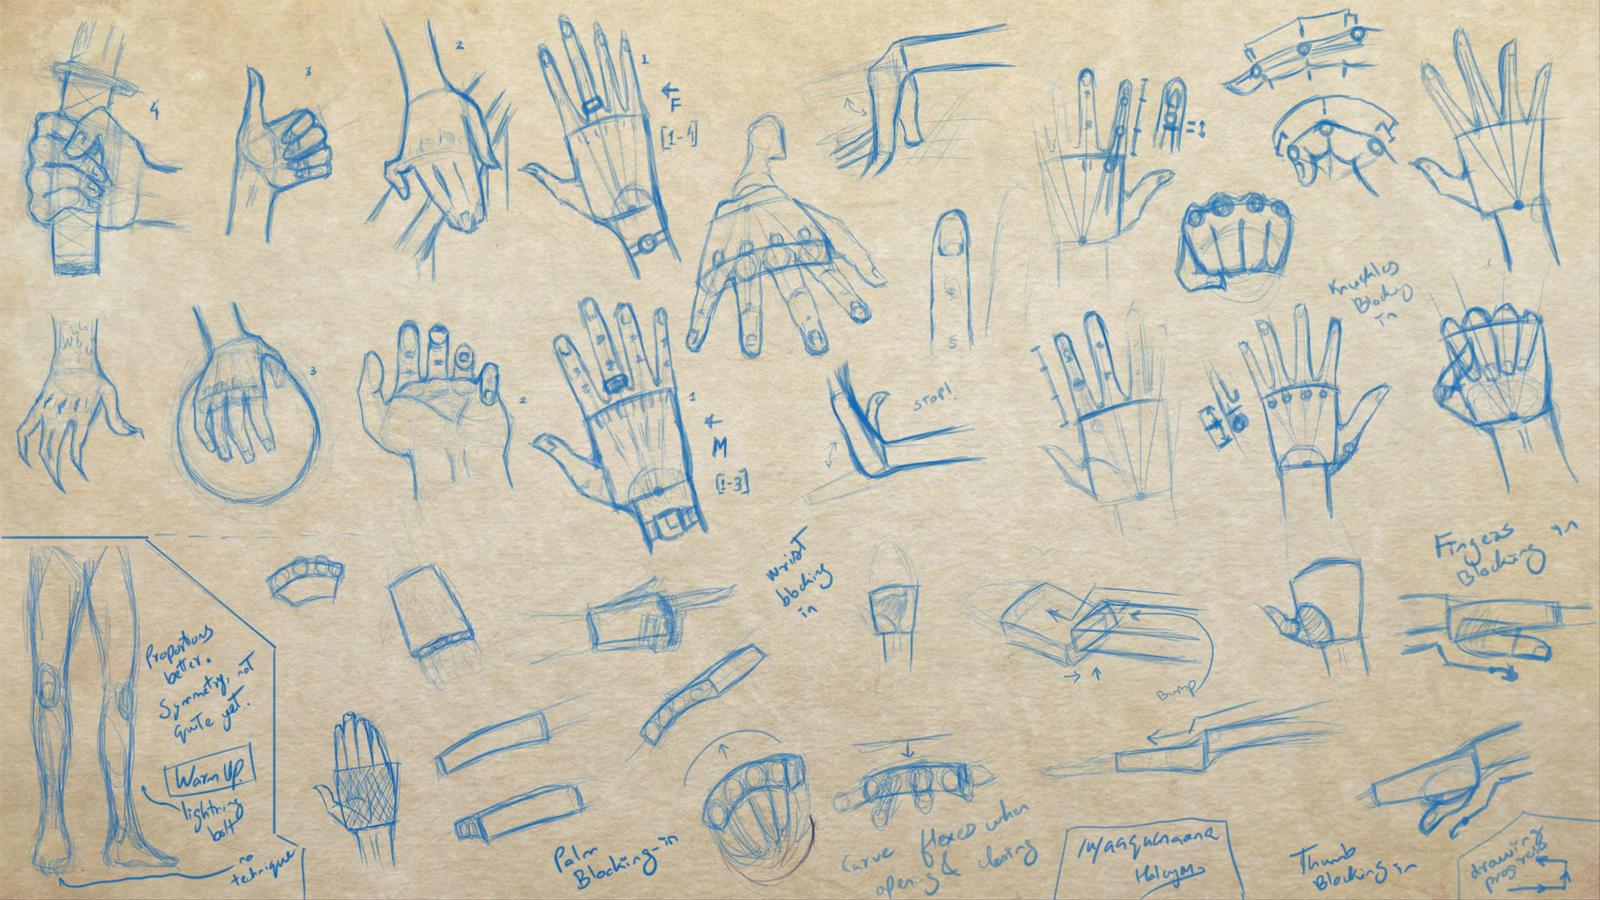 Hands Study, Artbuddy work #2 w/ Ravenwilder by aaqucnaona